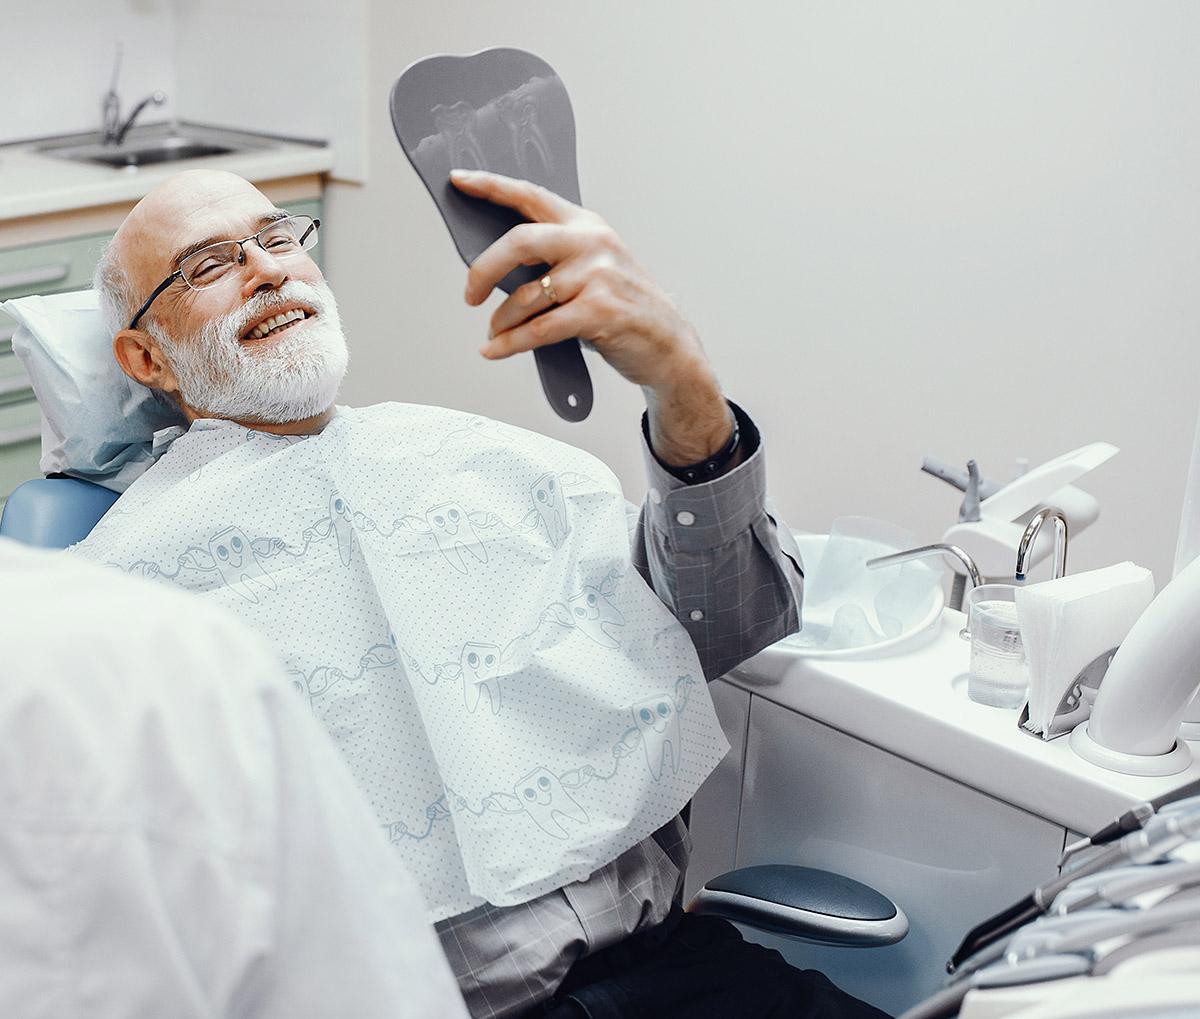 Dr. Hanania - Implants